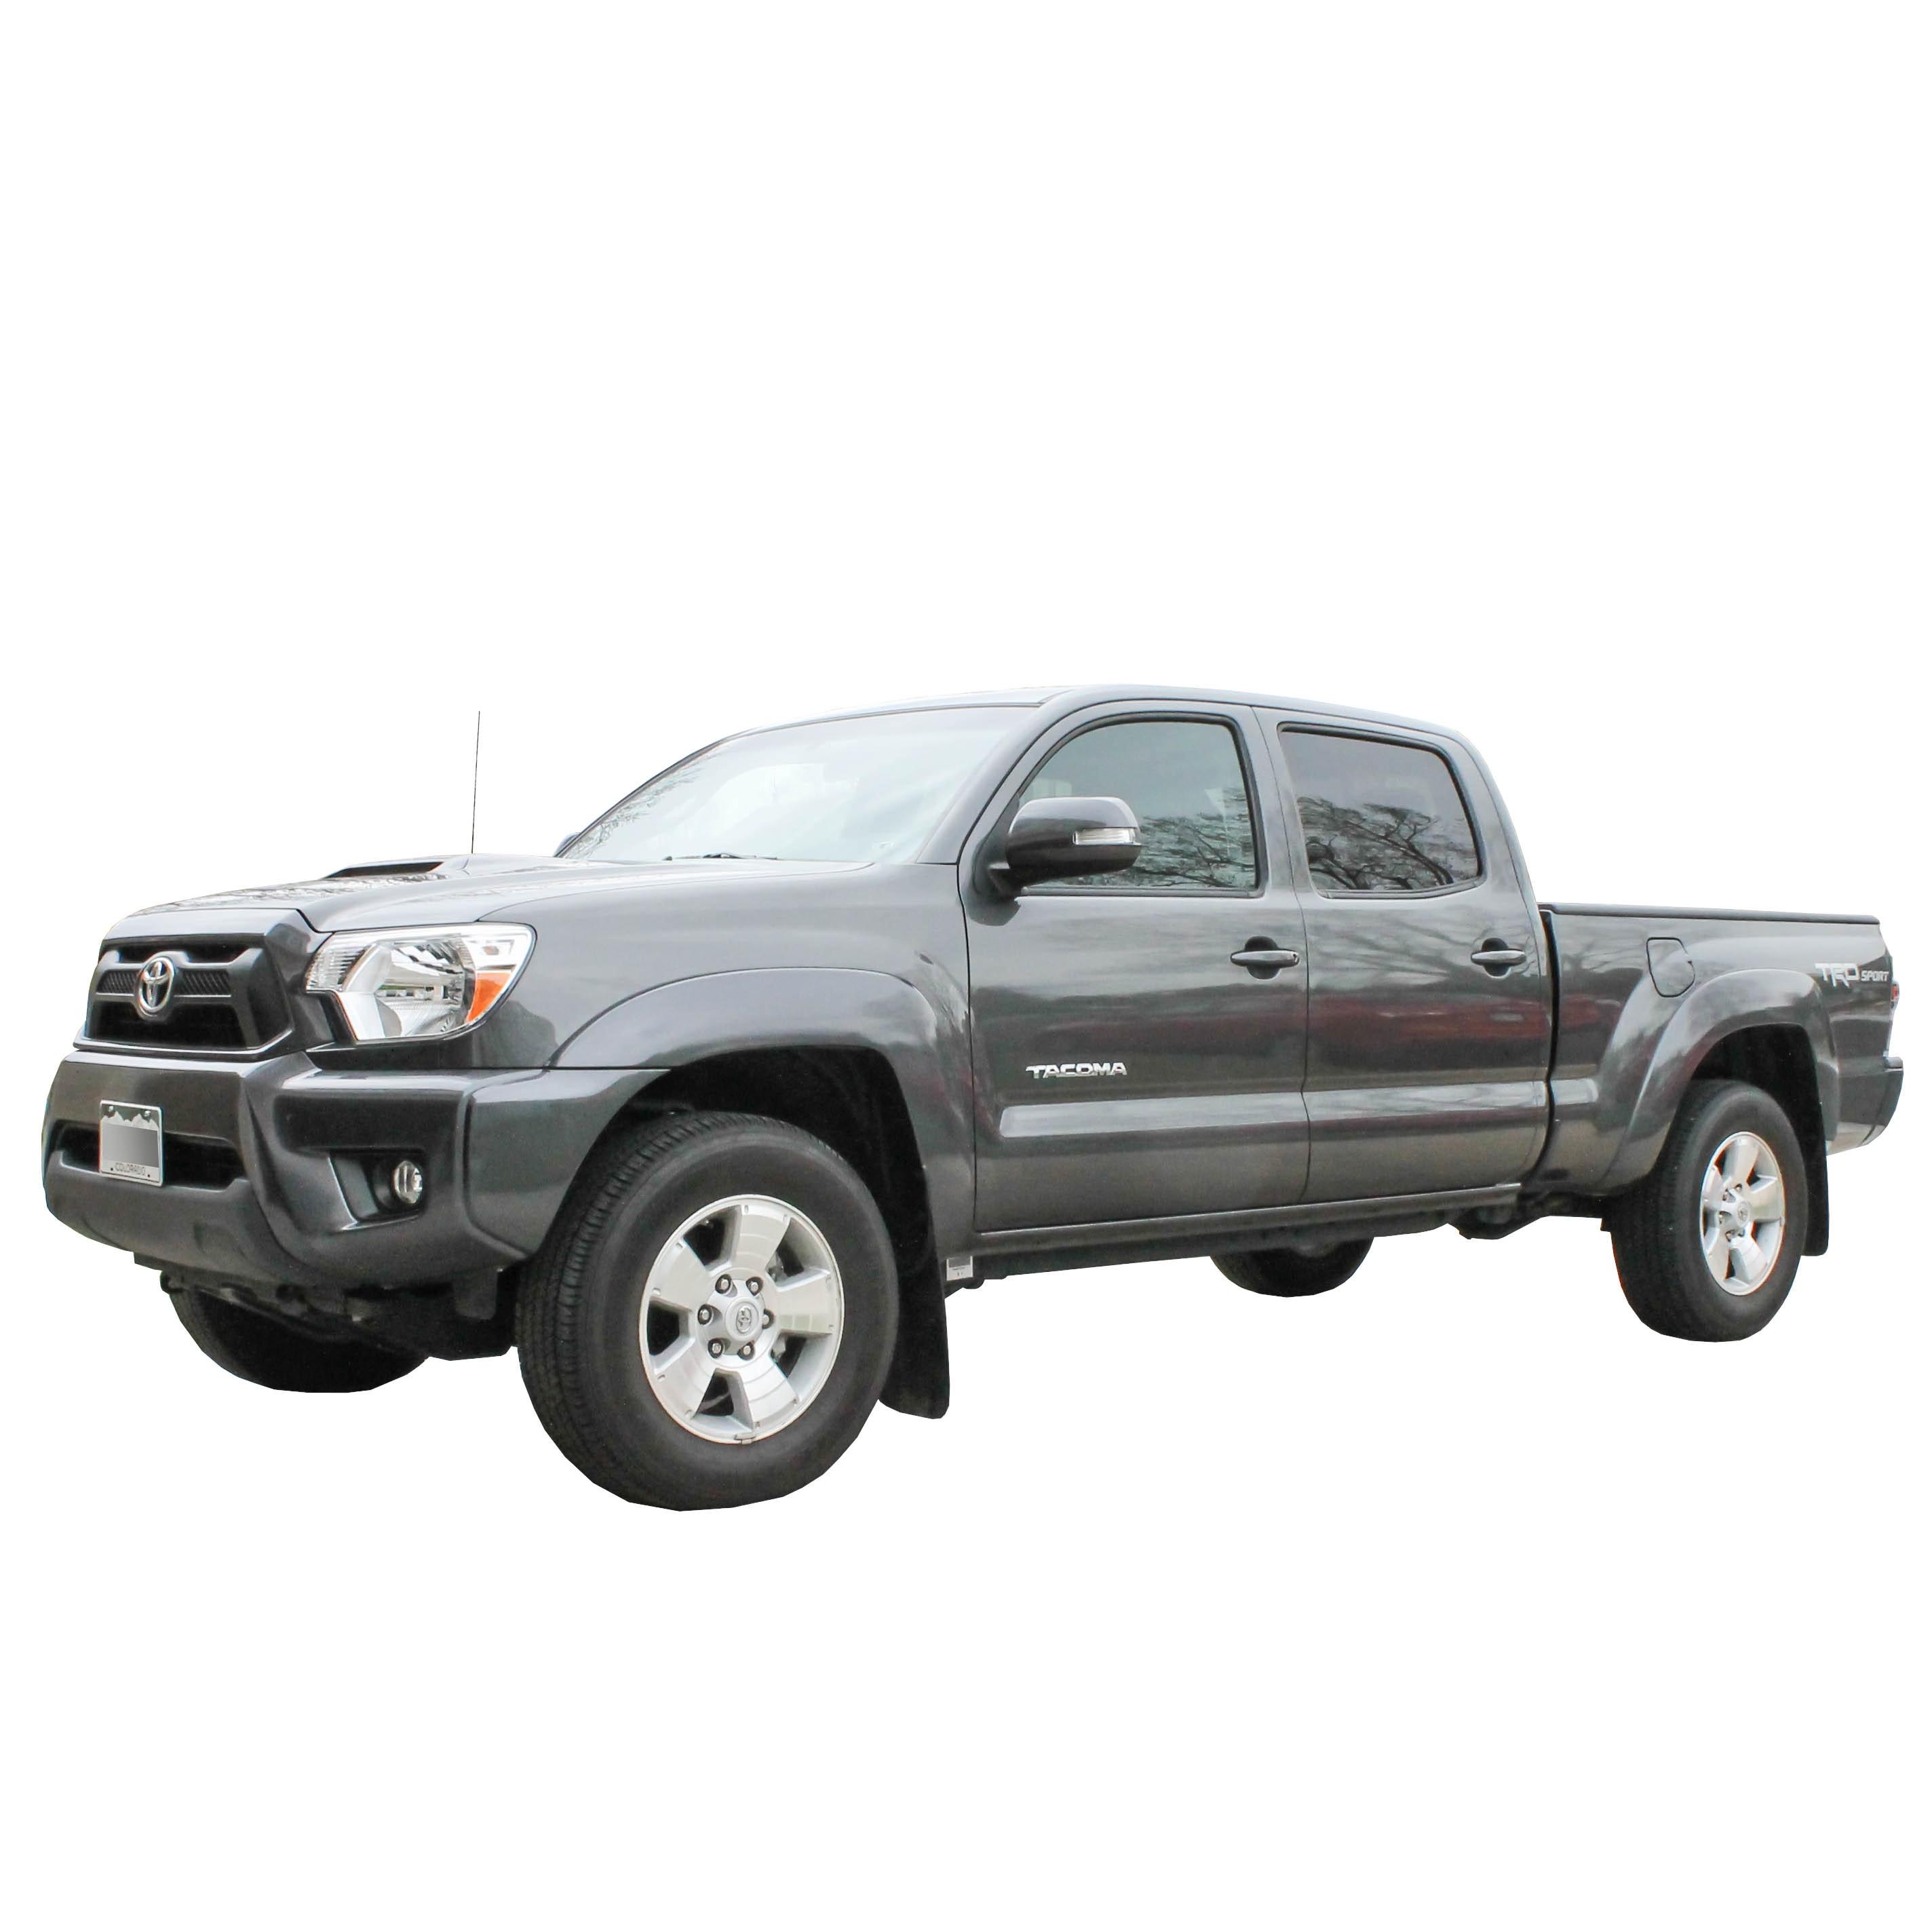 2014 Toyota Tacoma TRD Sport Pickup Truck